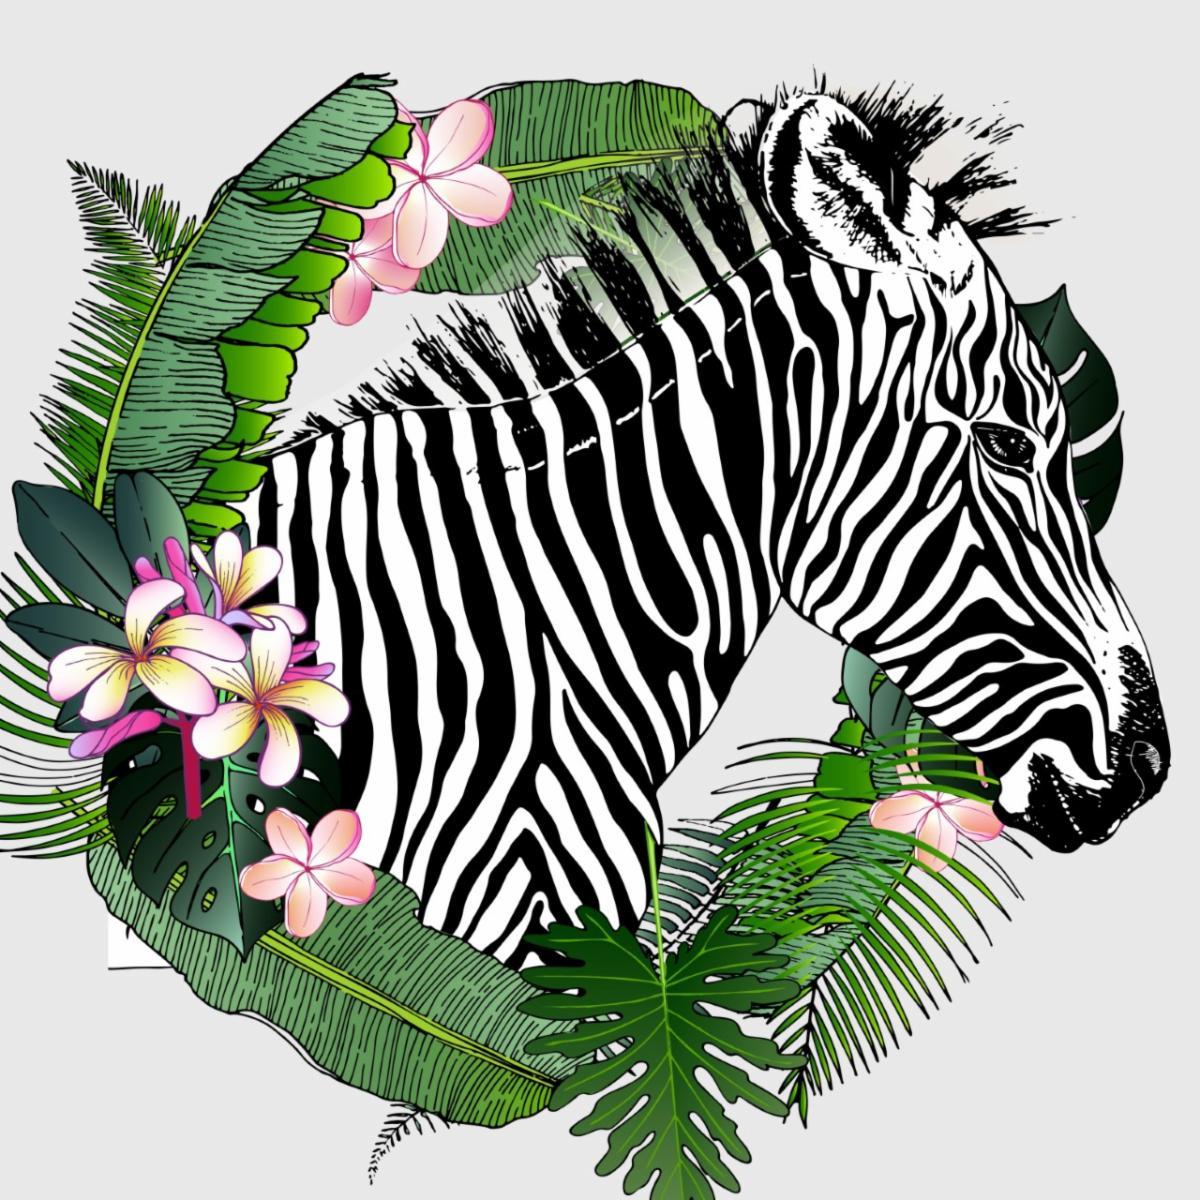 Zebra Gala 2020 Zebra n flowers